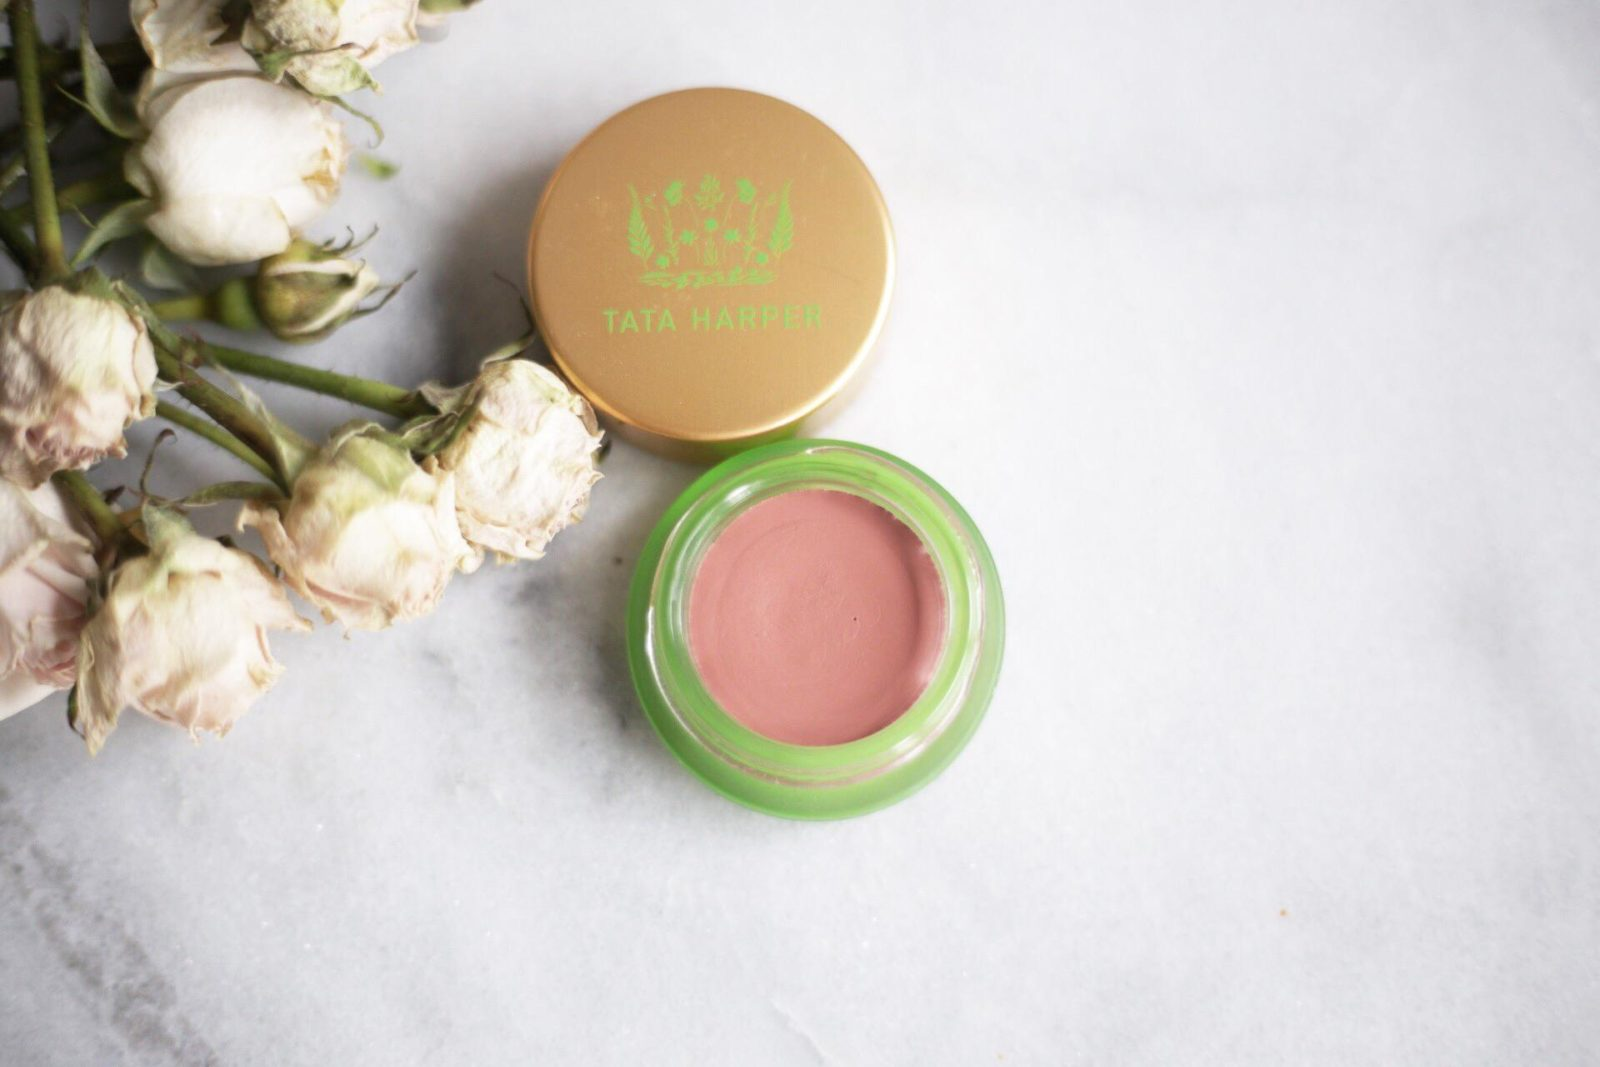 easy makeup tata harper plumping lip balm